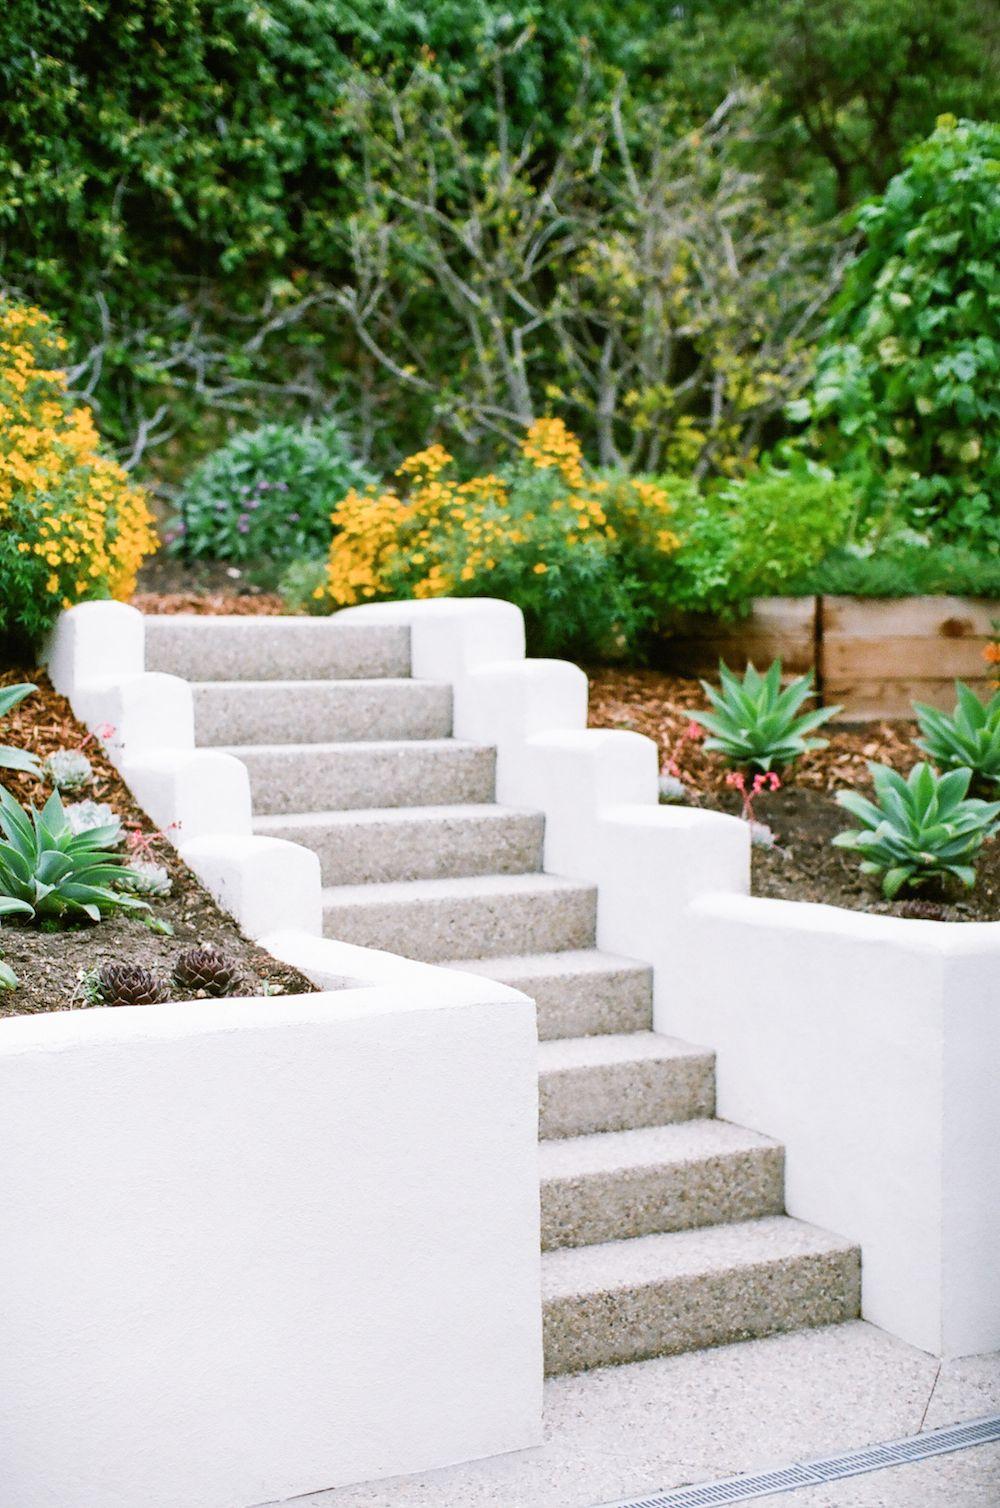 10 Genius Garden Hacks With Poured Concrete Gardenista Poured Concrete Patio Landscaping Retaining Walls Concrete Garden